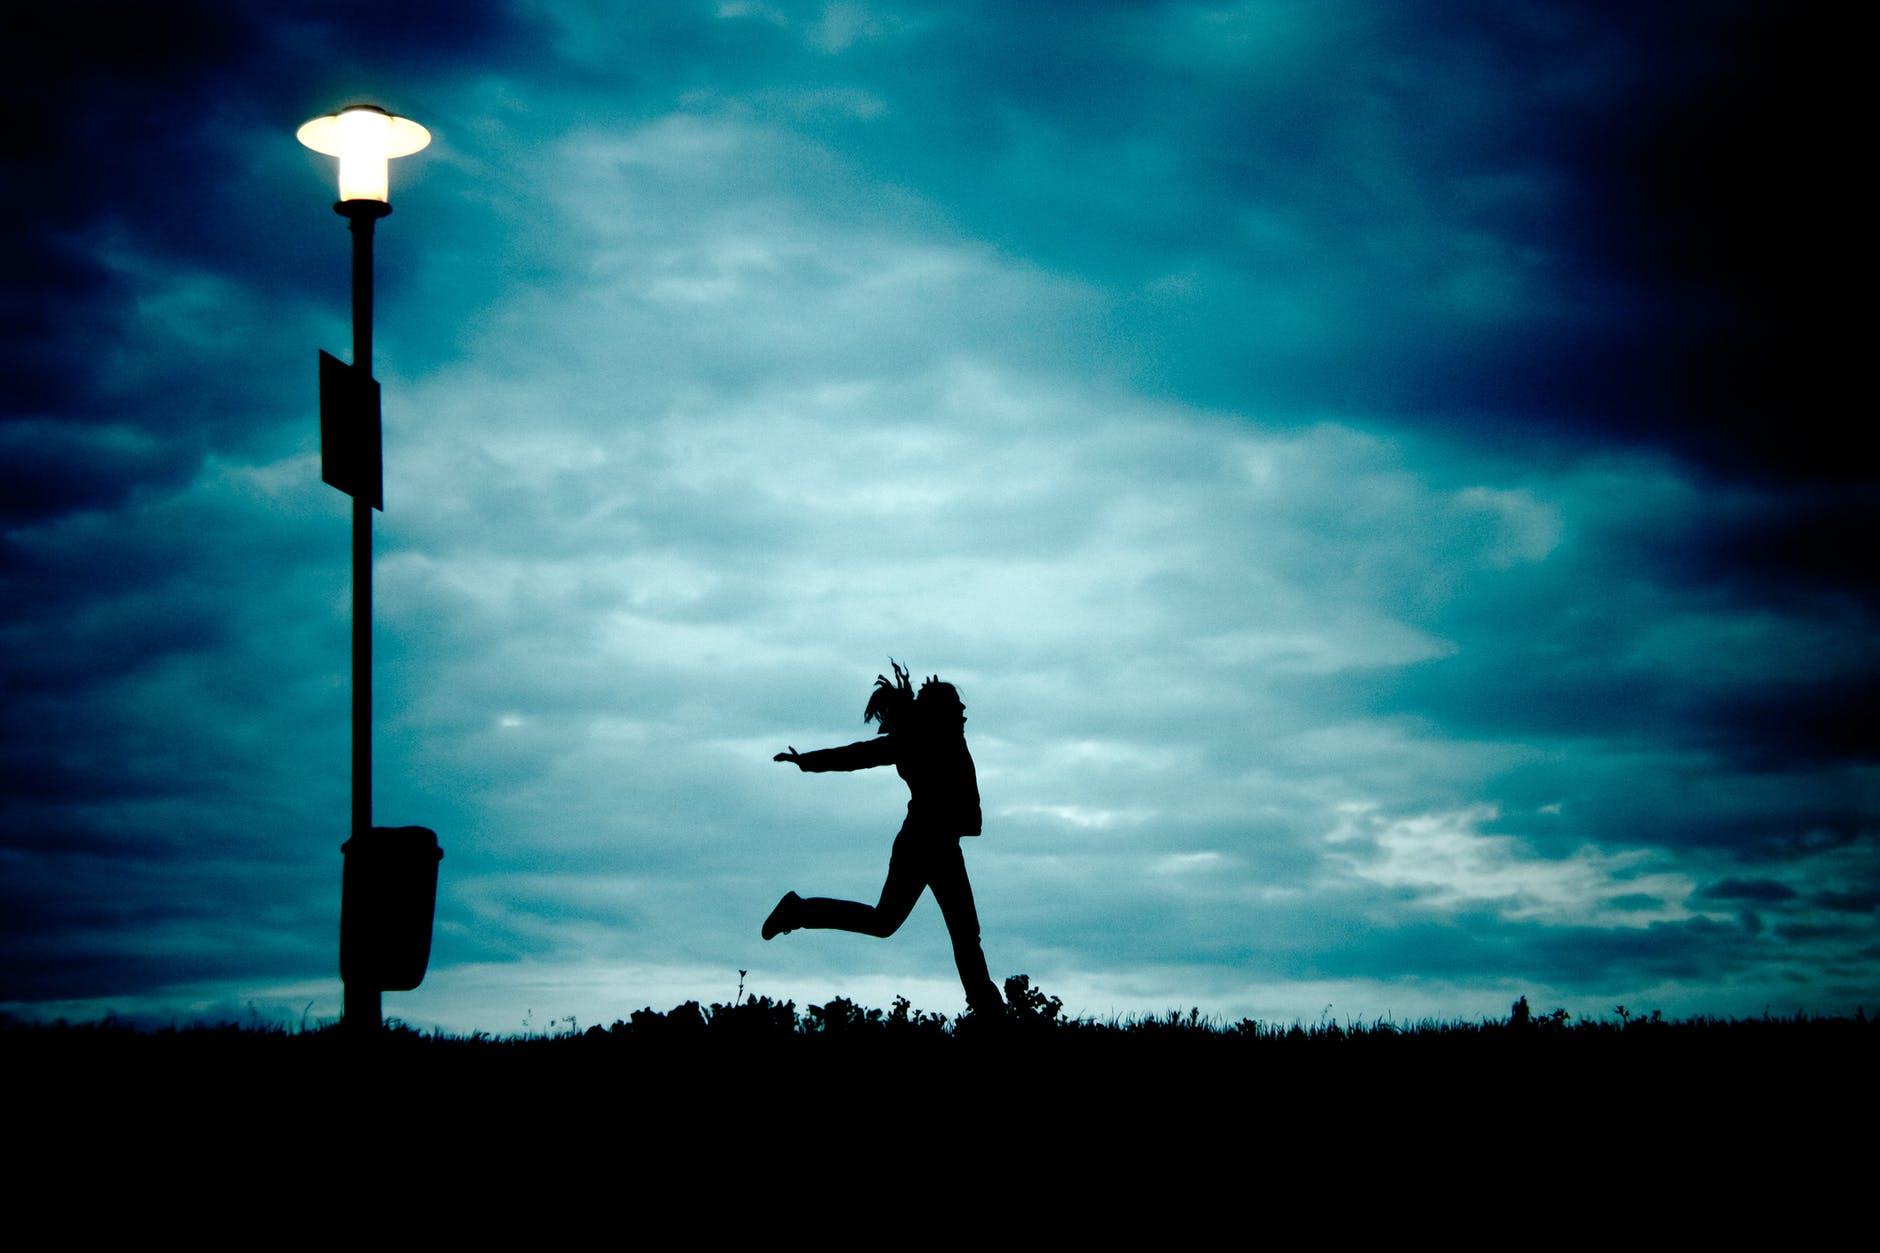 girl-at-night-running-cloud-68171.jpeg